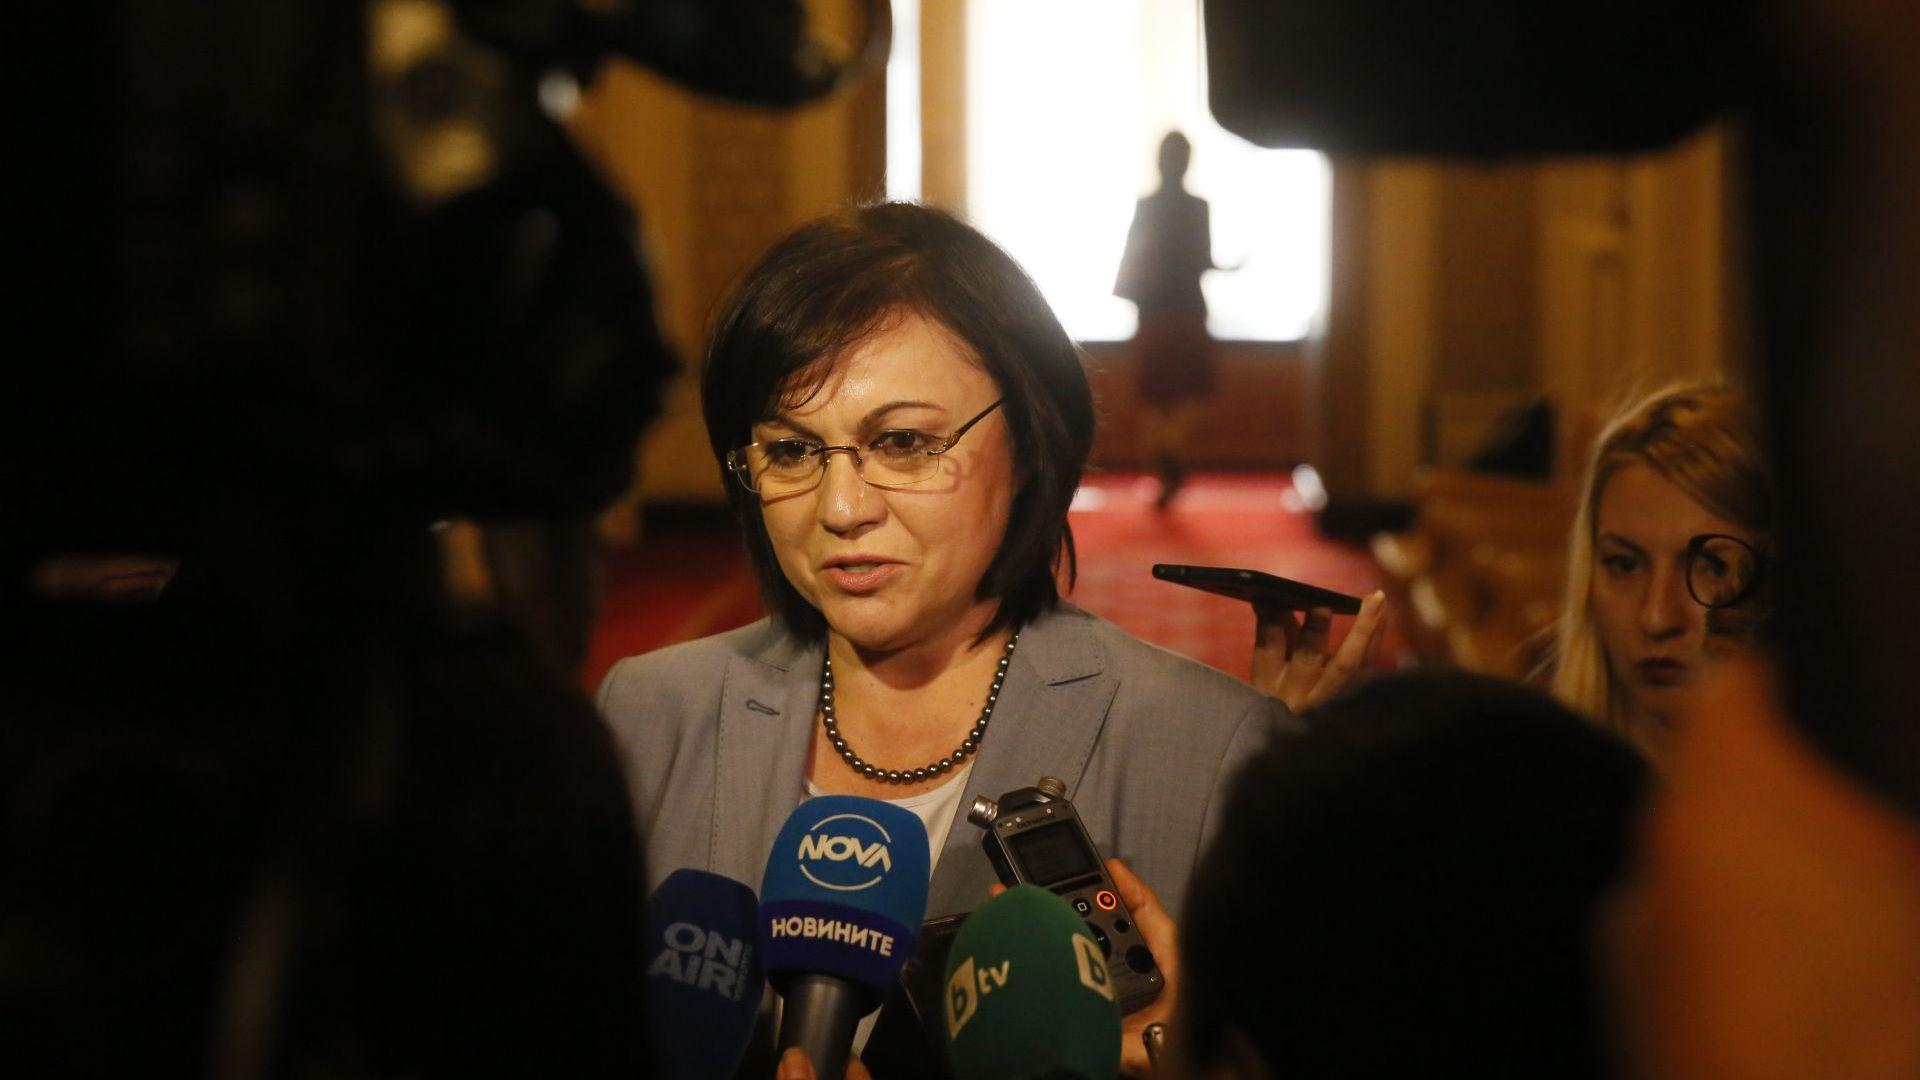 Нинова: Борисов едно говори пред българите, друго пред началниците